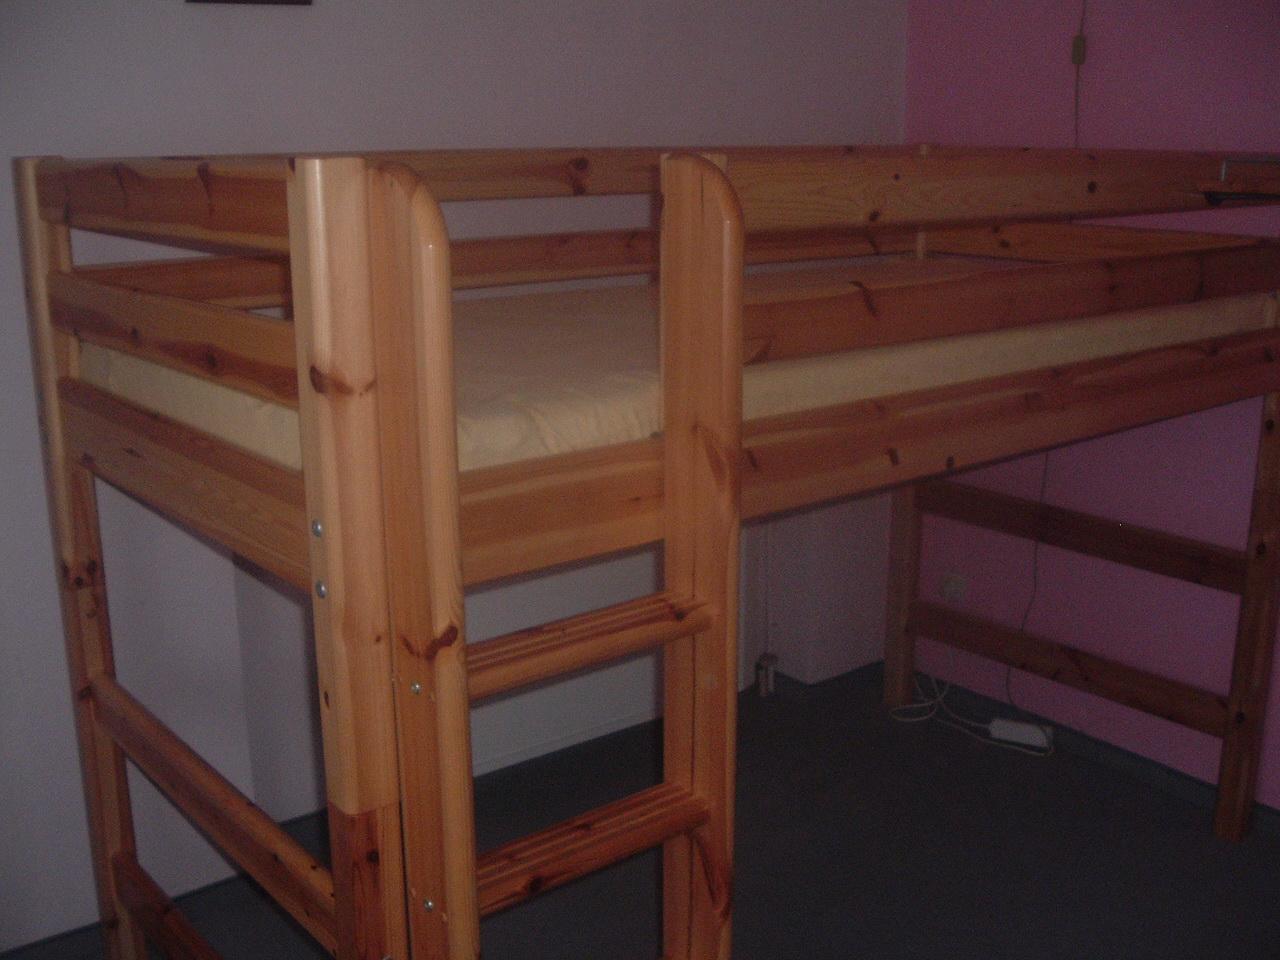 verkaufe flexa hochbett raum n rnberg kaufen u verkaufen forum. Black Bedroom Furniture Sets. Home Design Ideas